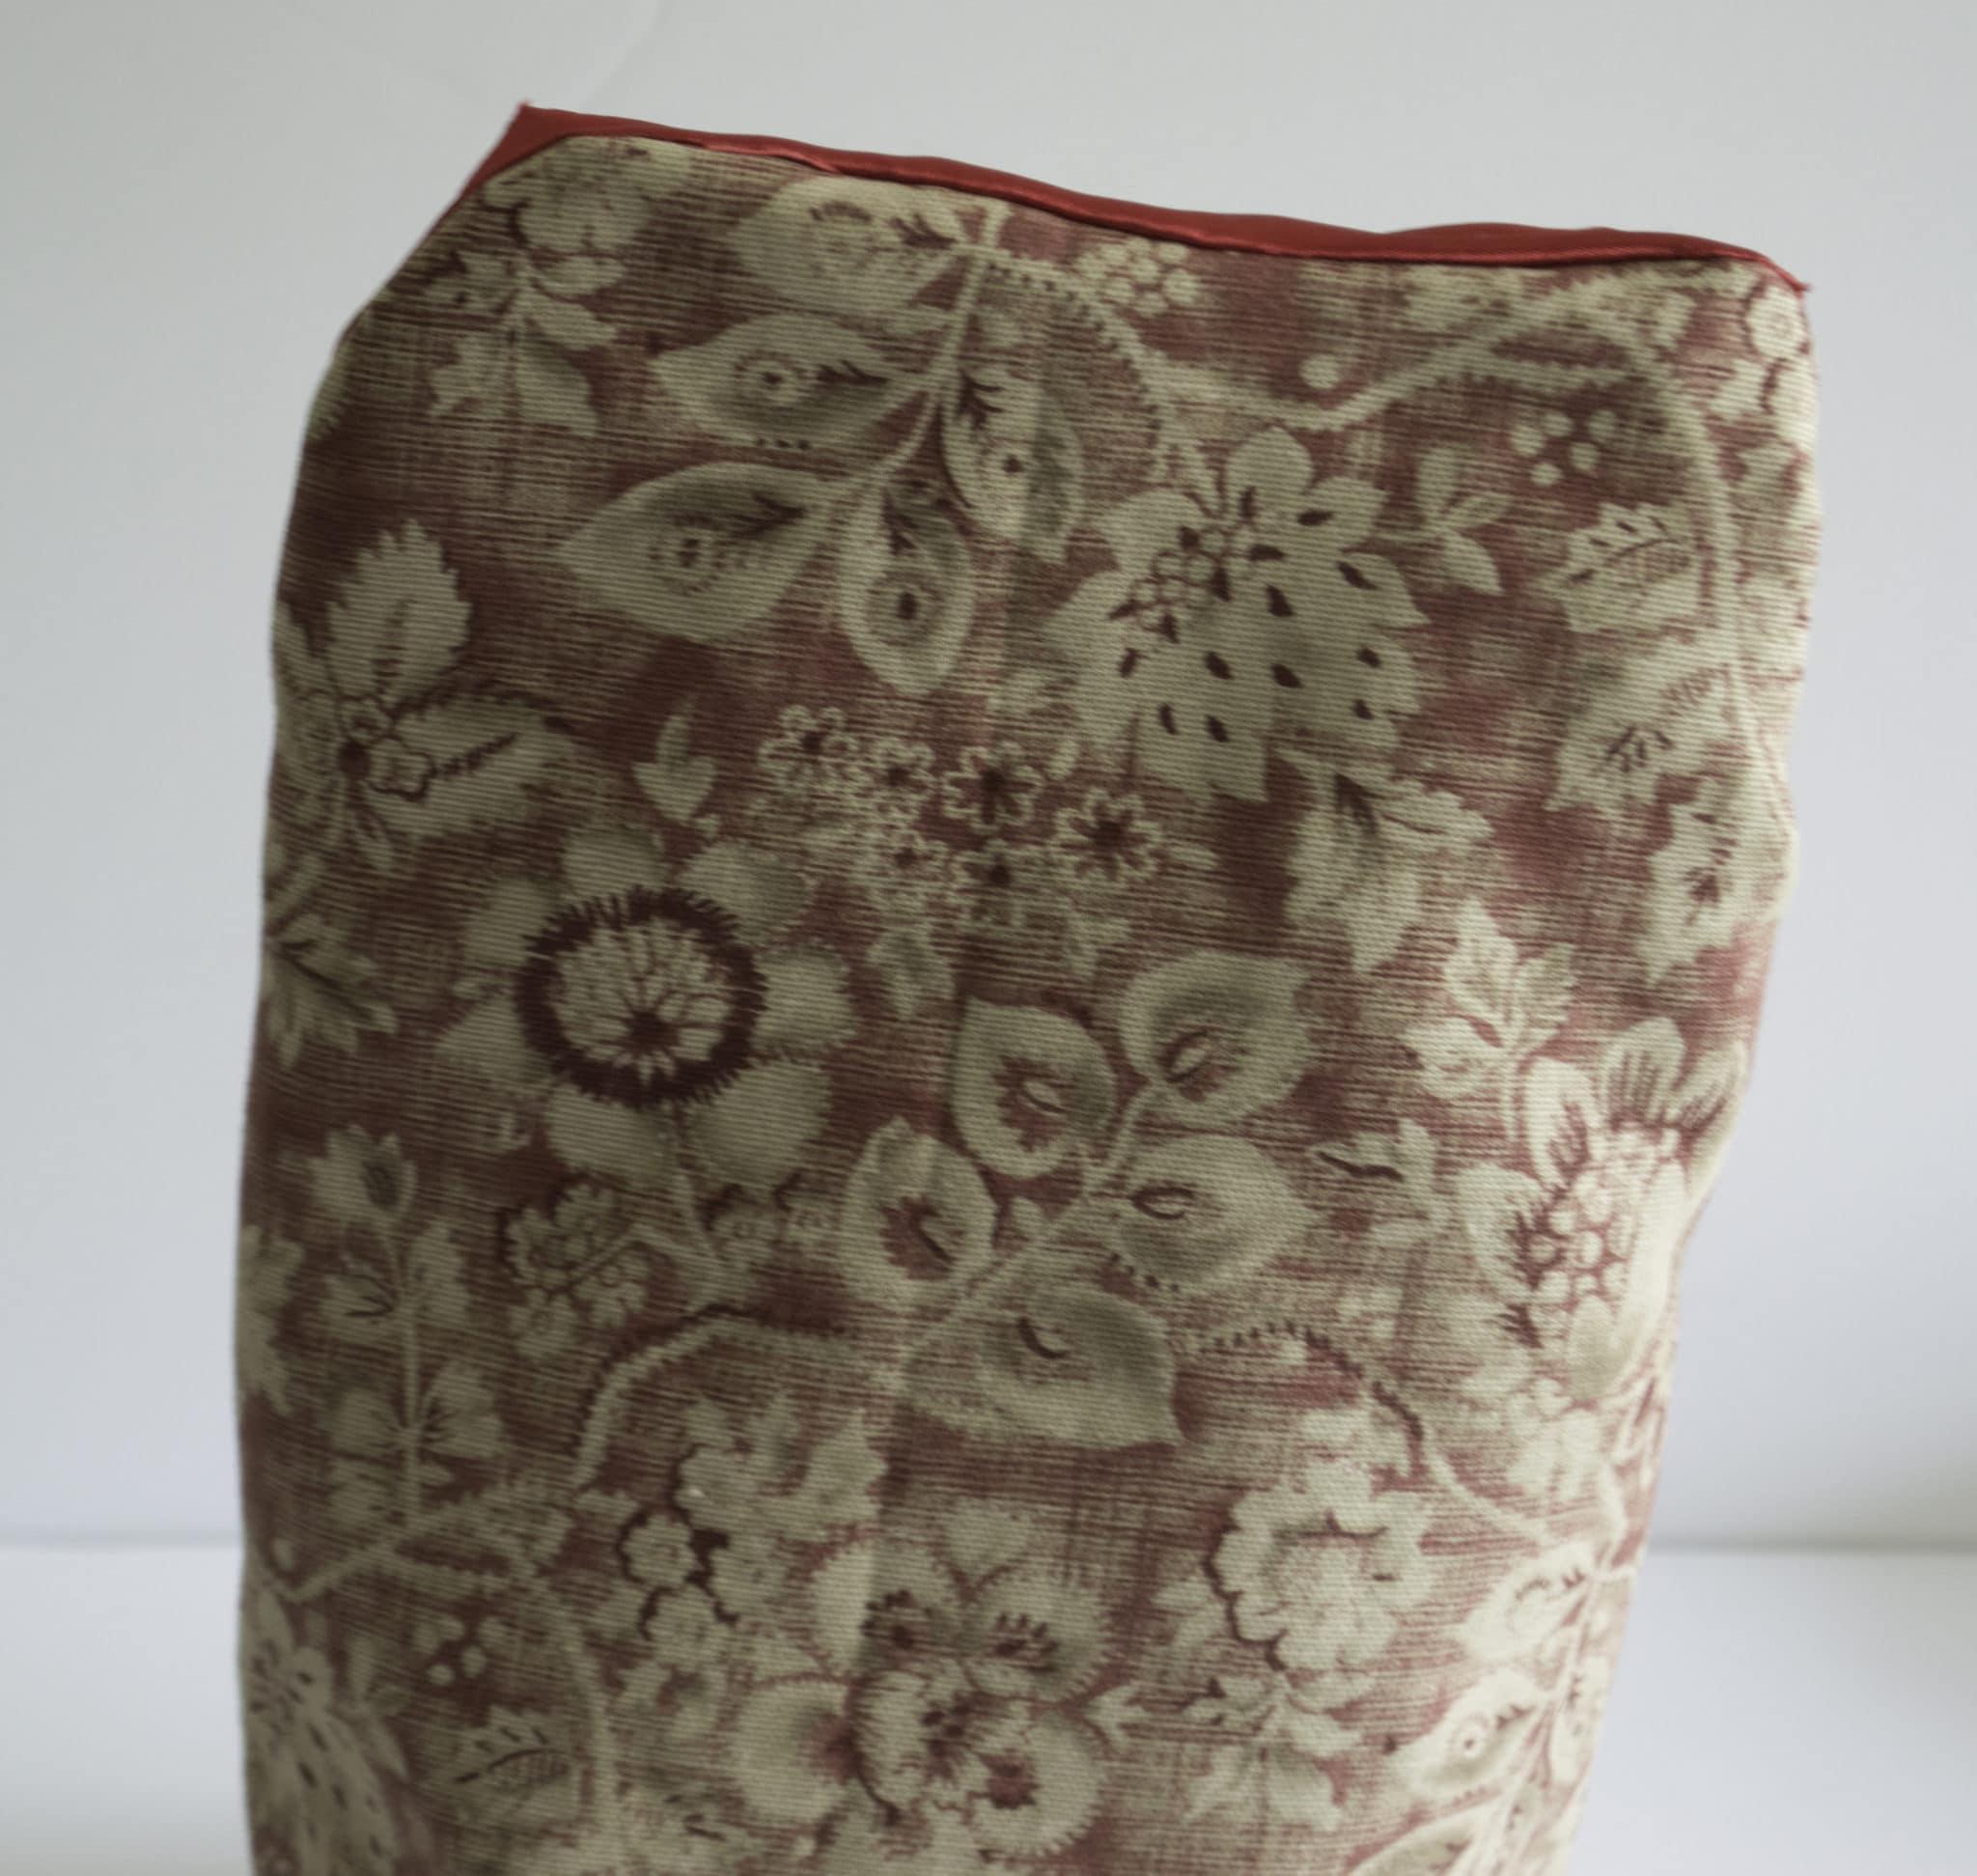 How to make a purse frame handbag in 6 easy steps - Sew Very Crafty